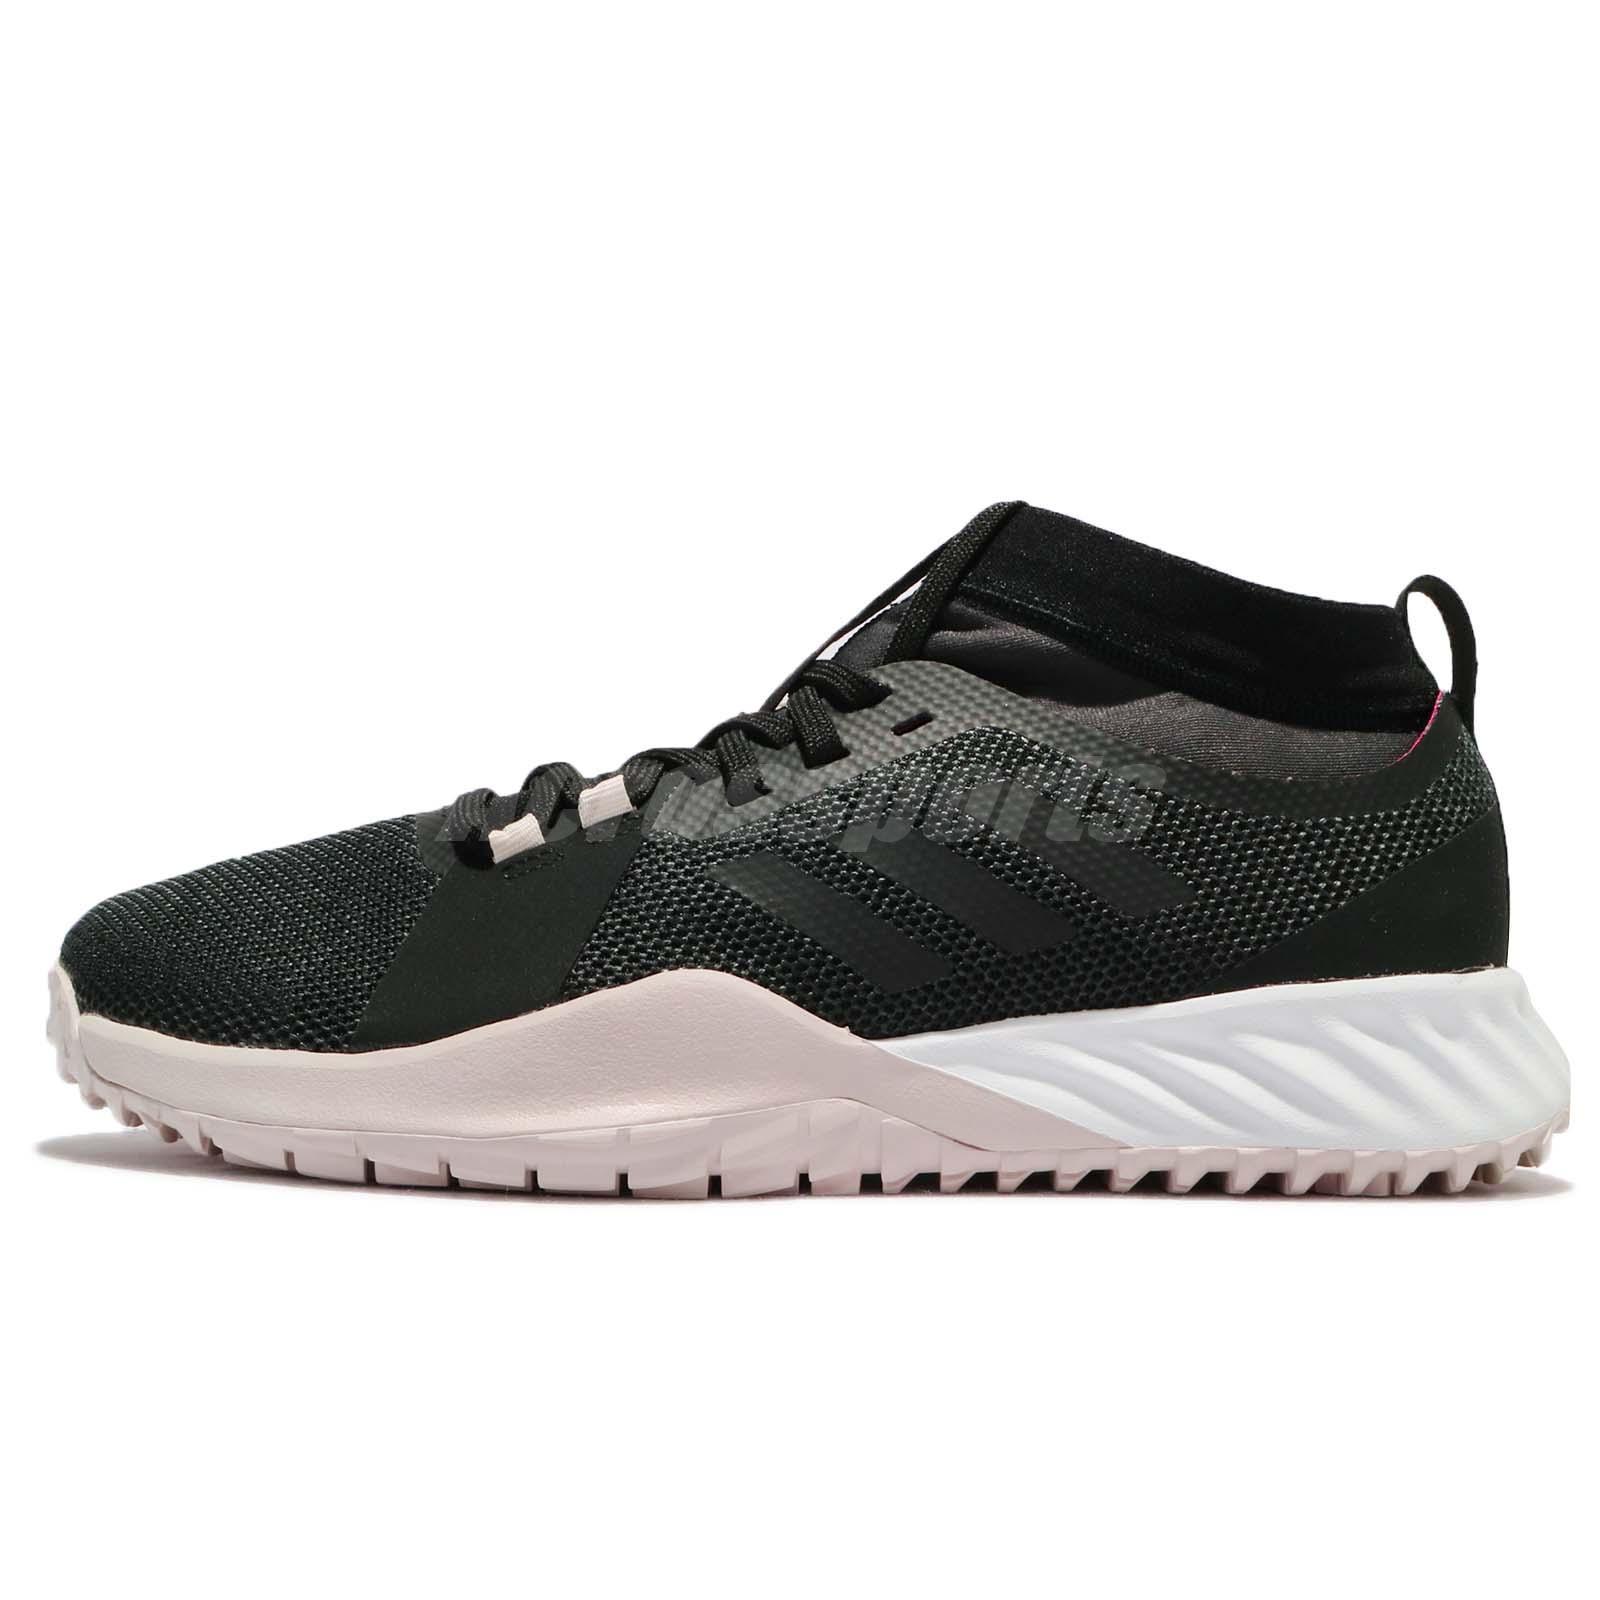 a79d76db20982 adidas CrazyTrain Pro 3.0 TRF M TURF Men Carbon Black Cross Training Shoe  CG3486